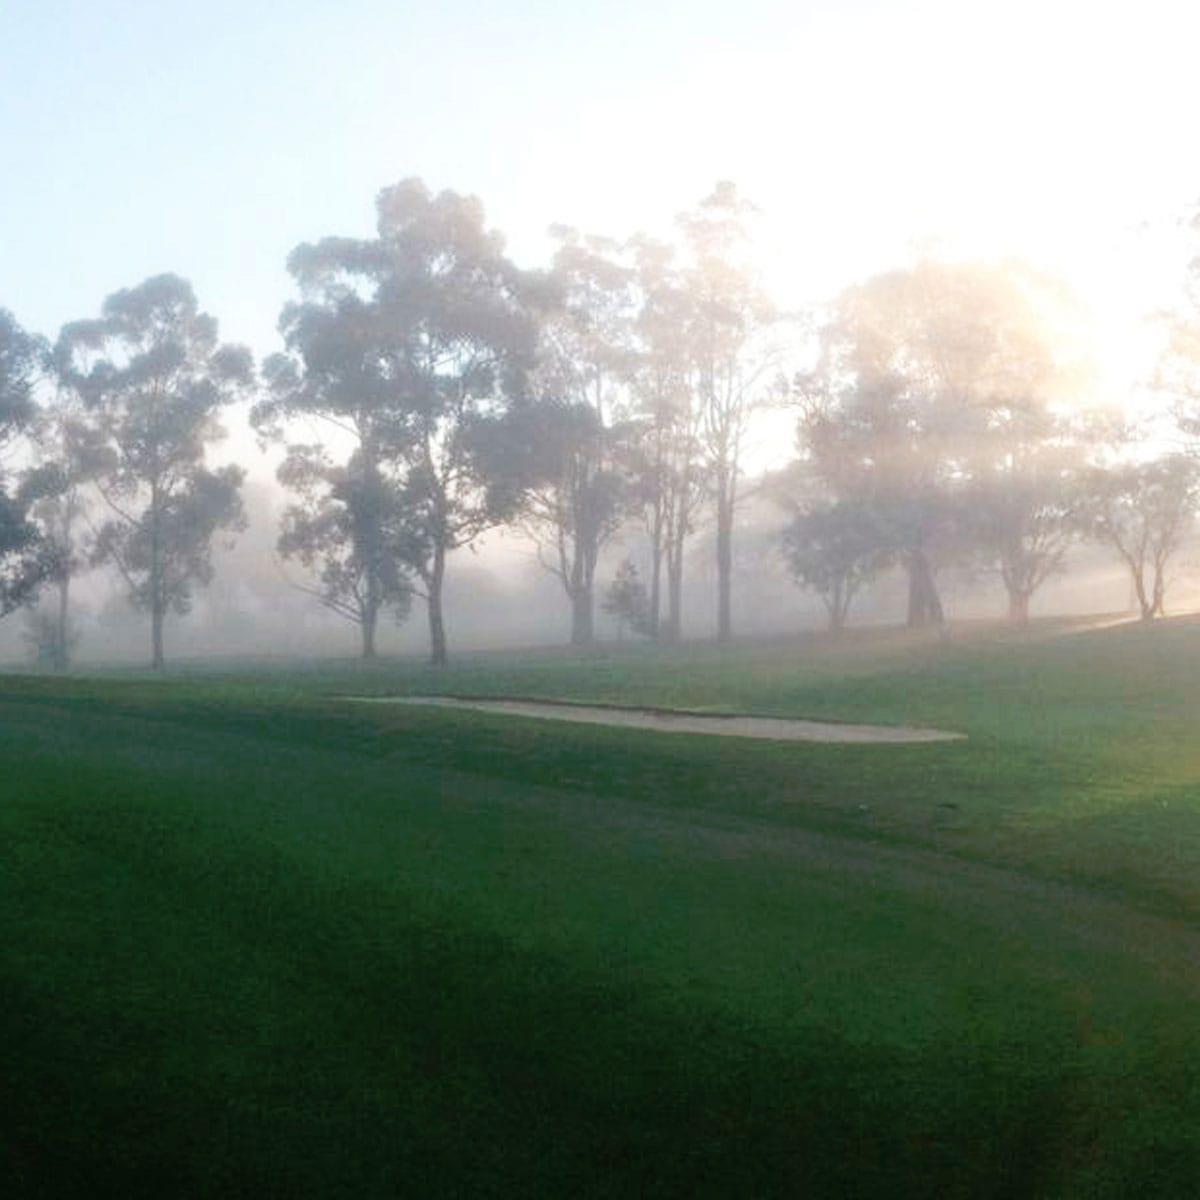 Pambula-Merimbula Golf Club